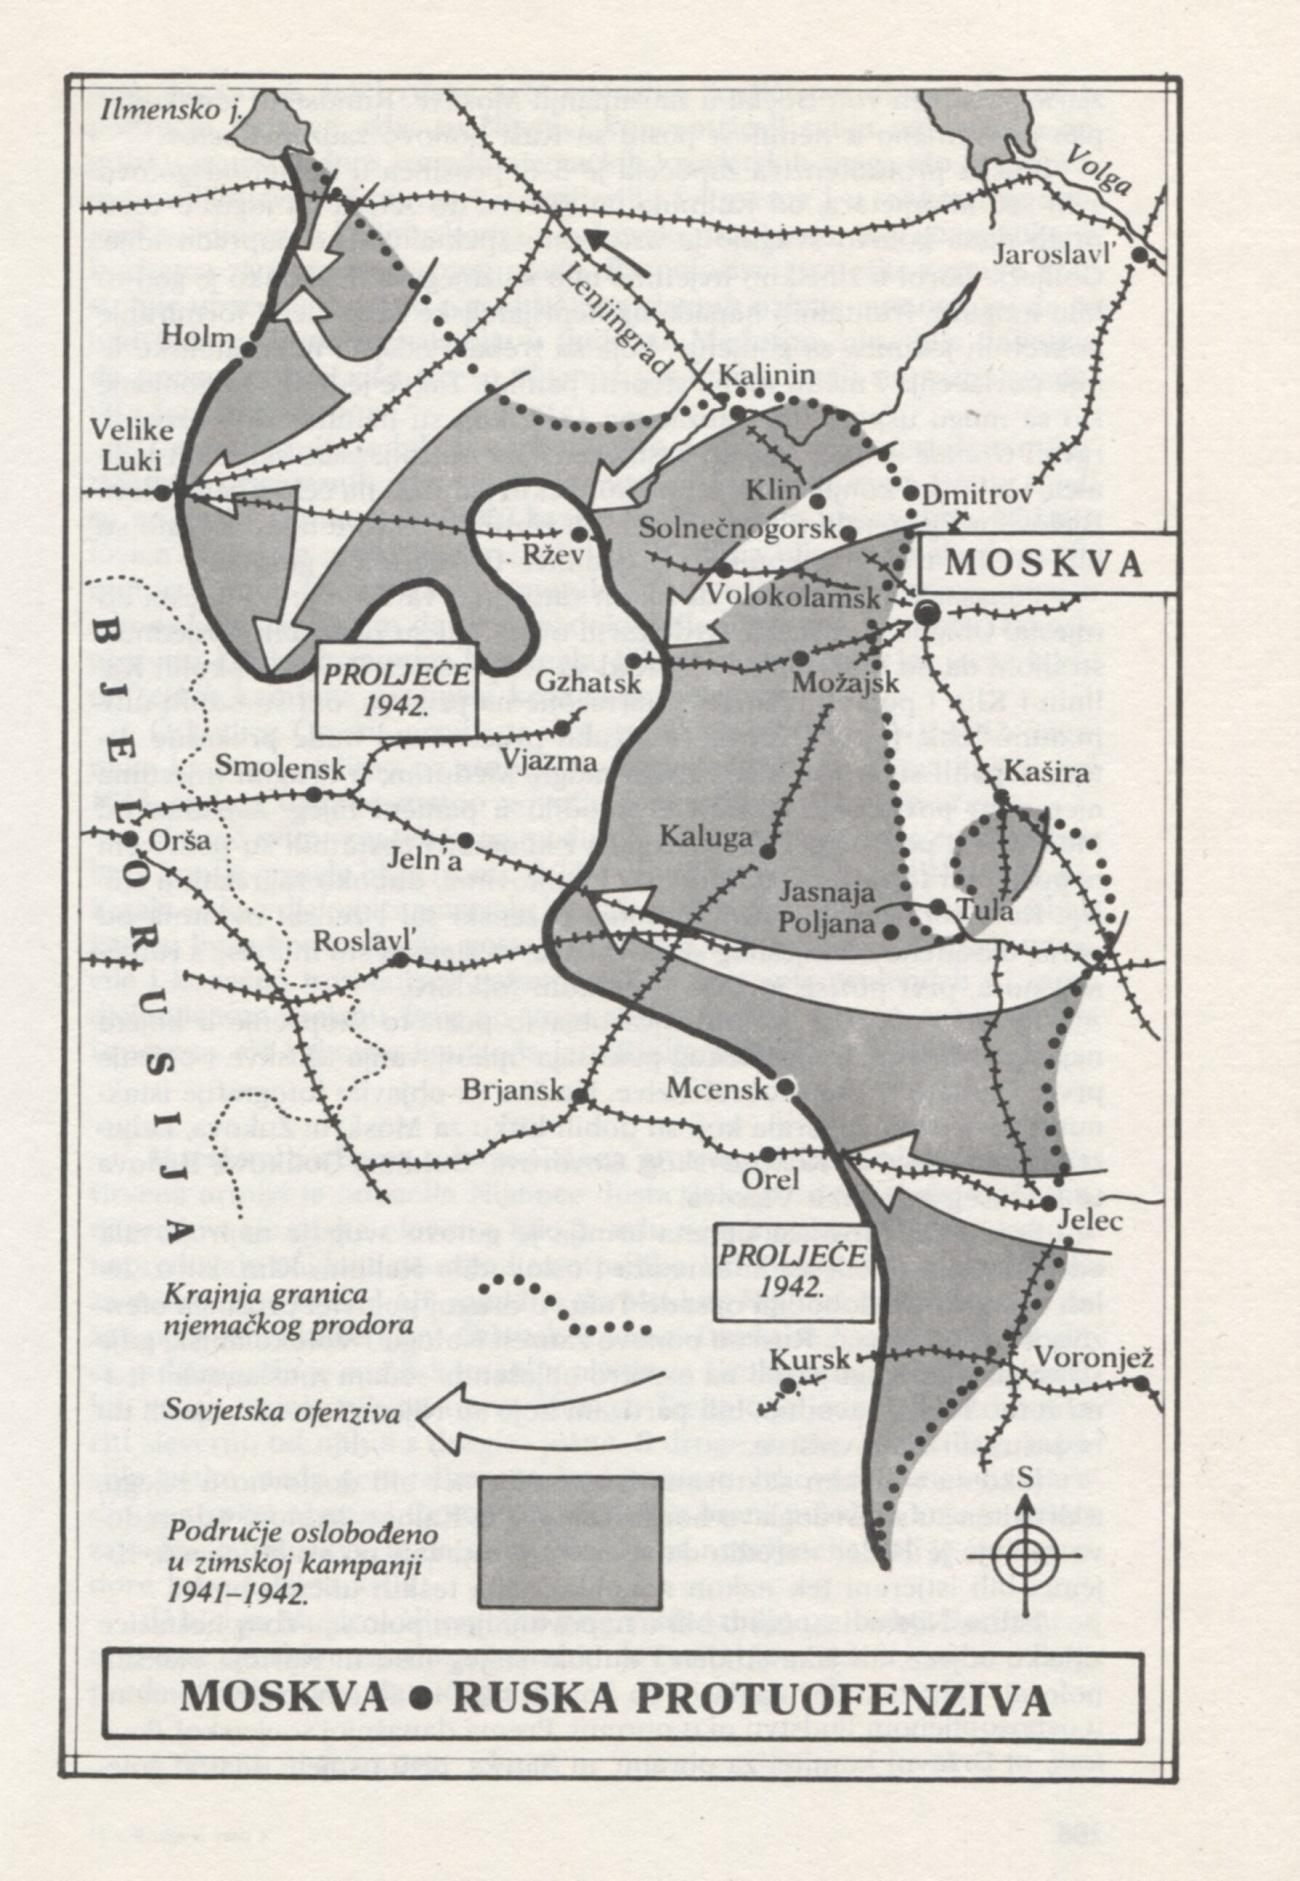 Ruska protiofenziva 5. decembra 1941. Vir: Alexander Werth, Rusija u ratu 1941-1945